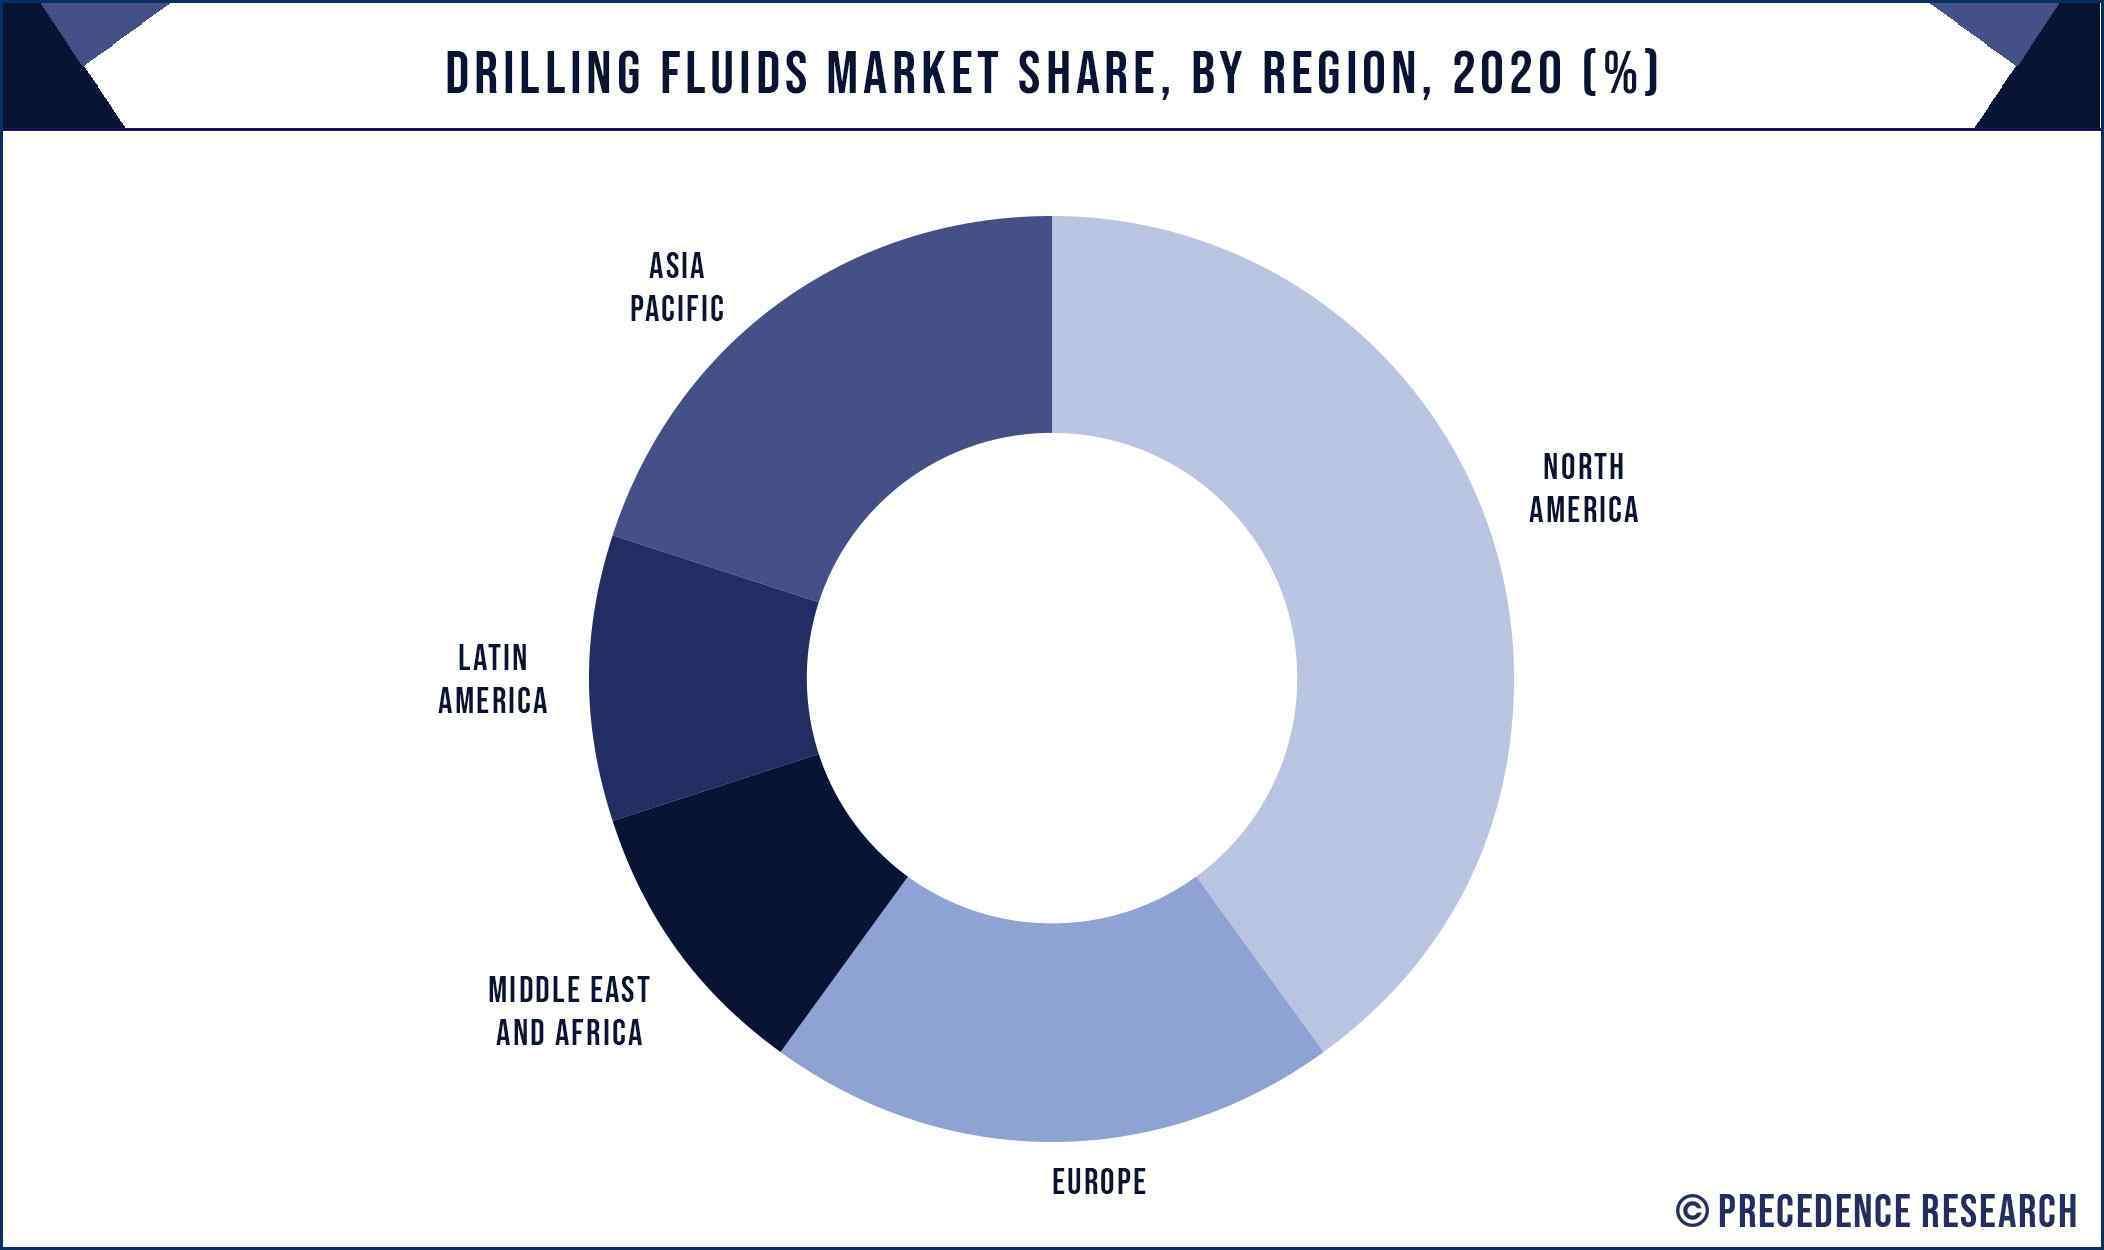 Drilling Fluids Market Share, By Region, 2020 (%)